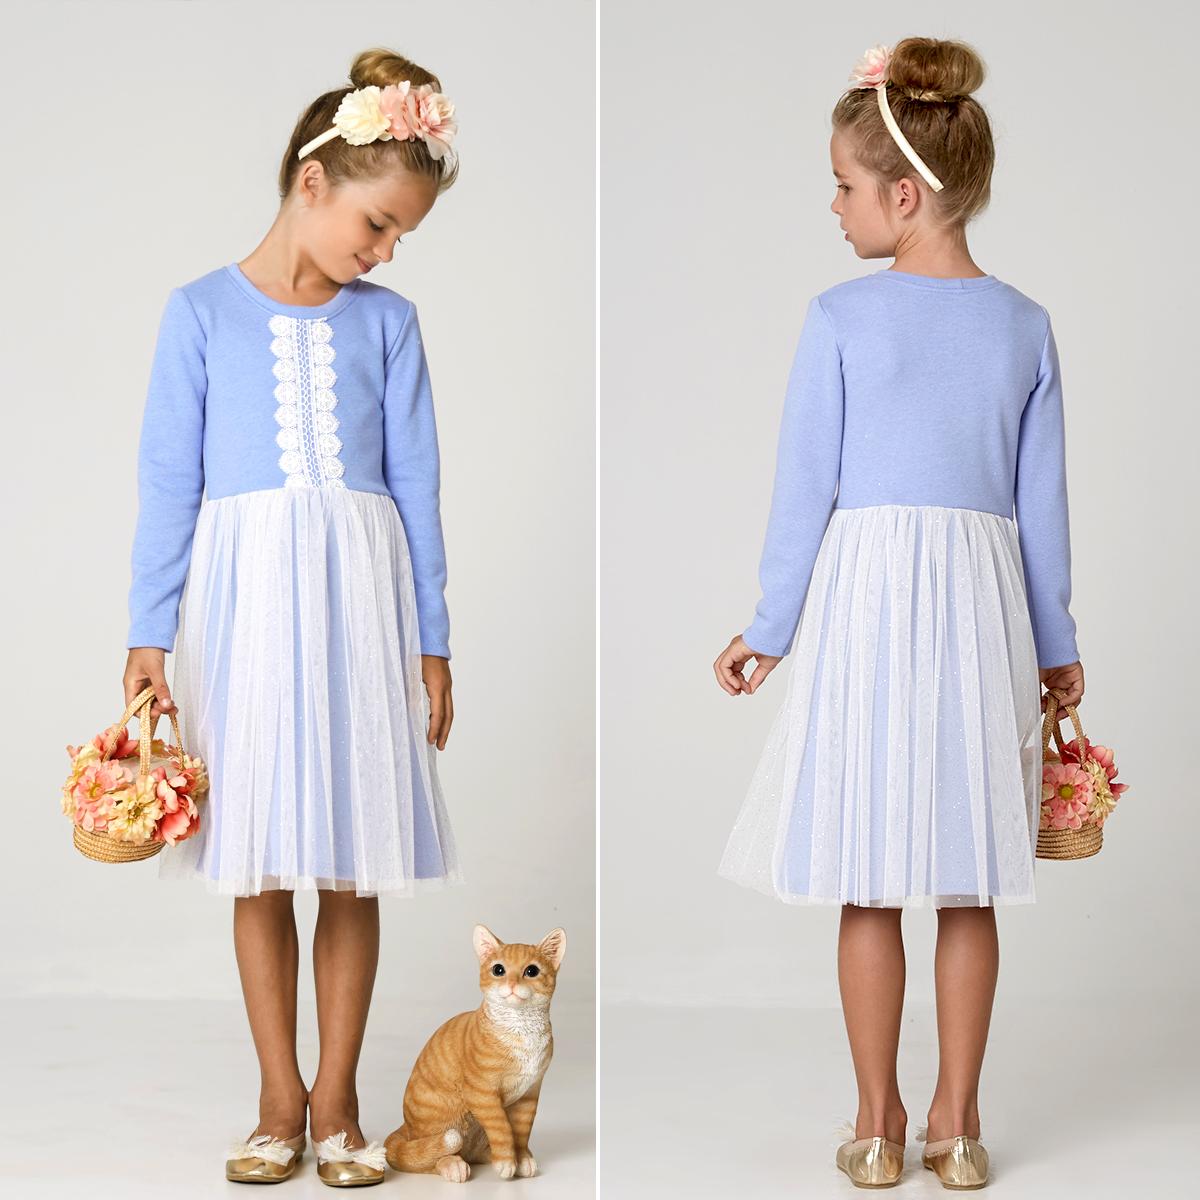 Willow dress pattern